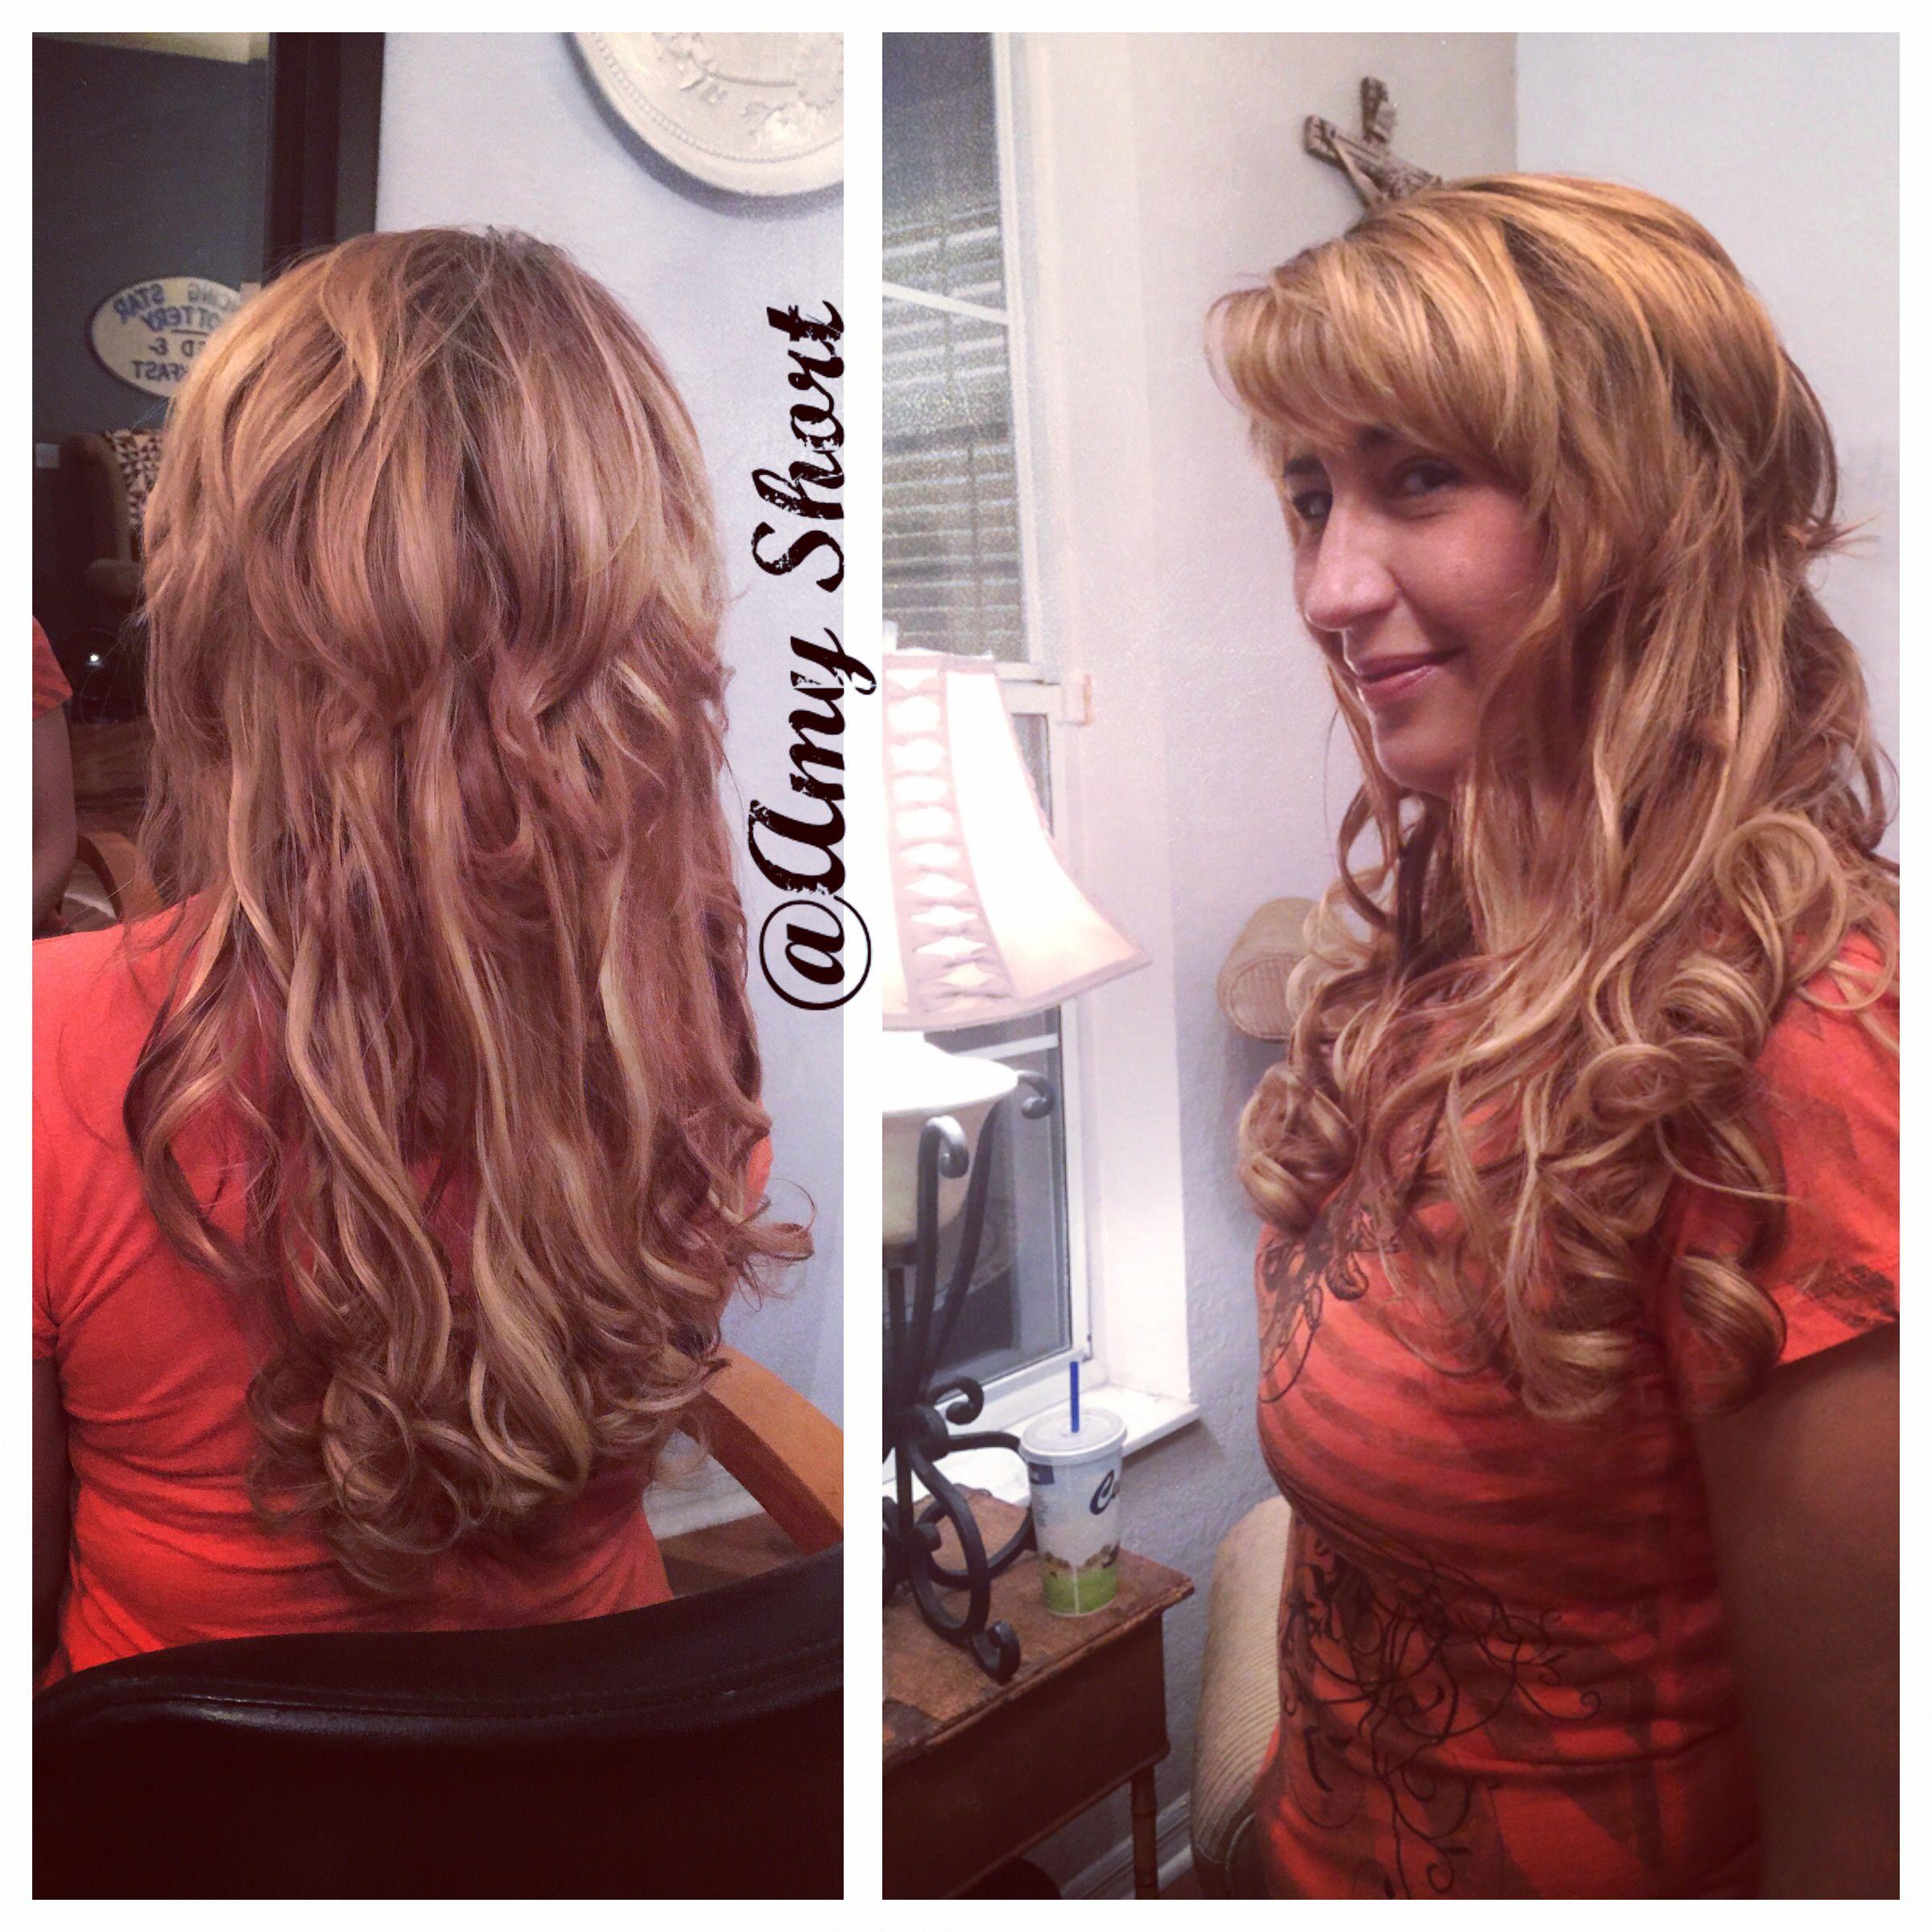 Hair Extensions By Amy Amy Short Hair Artist Pinterest Hair